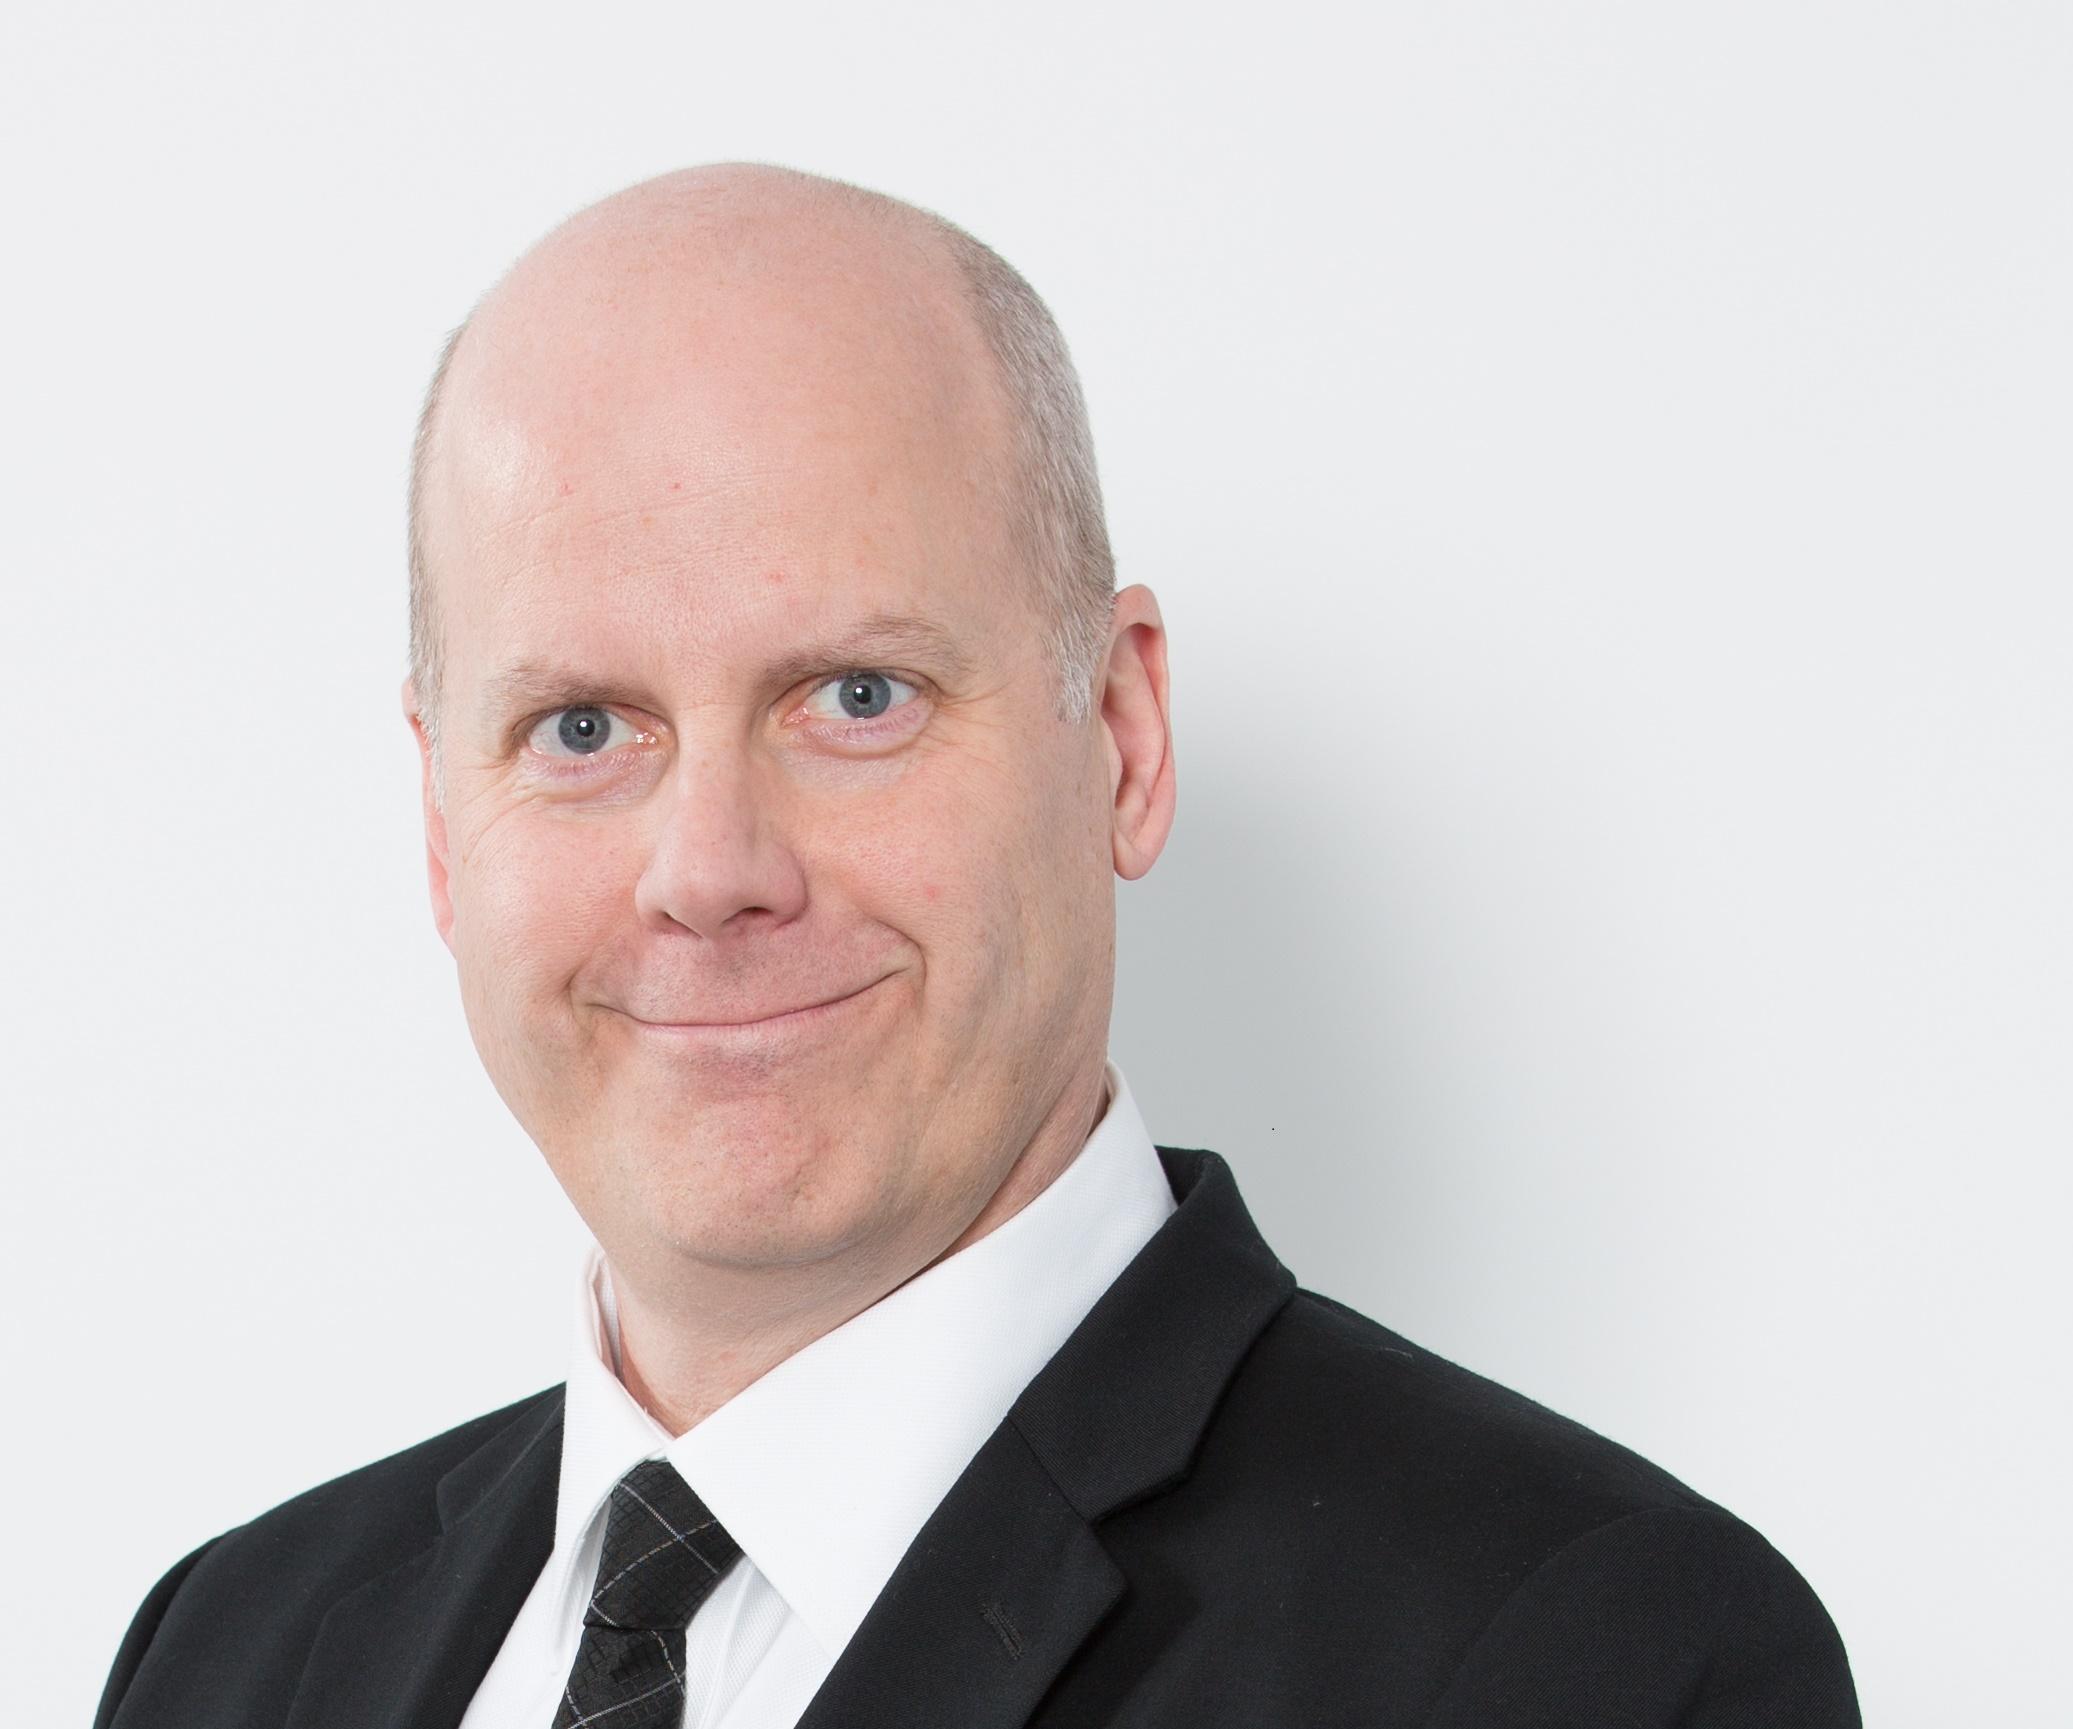 Dan Ulrich Profile Investigations